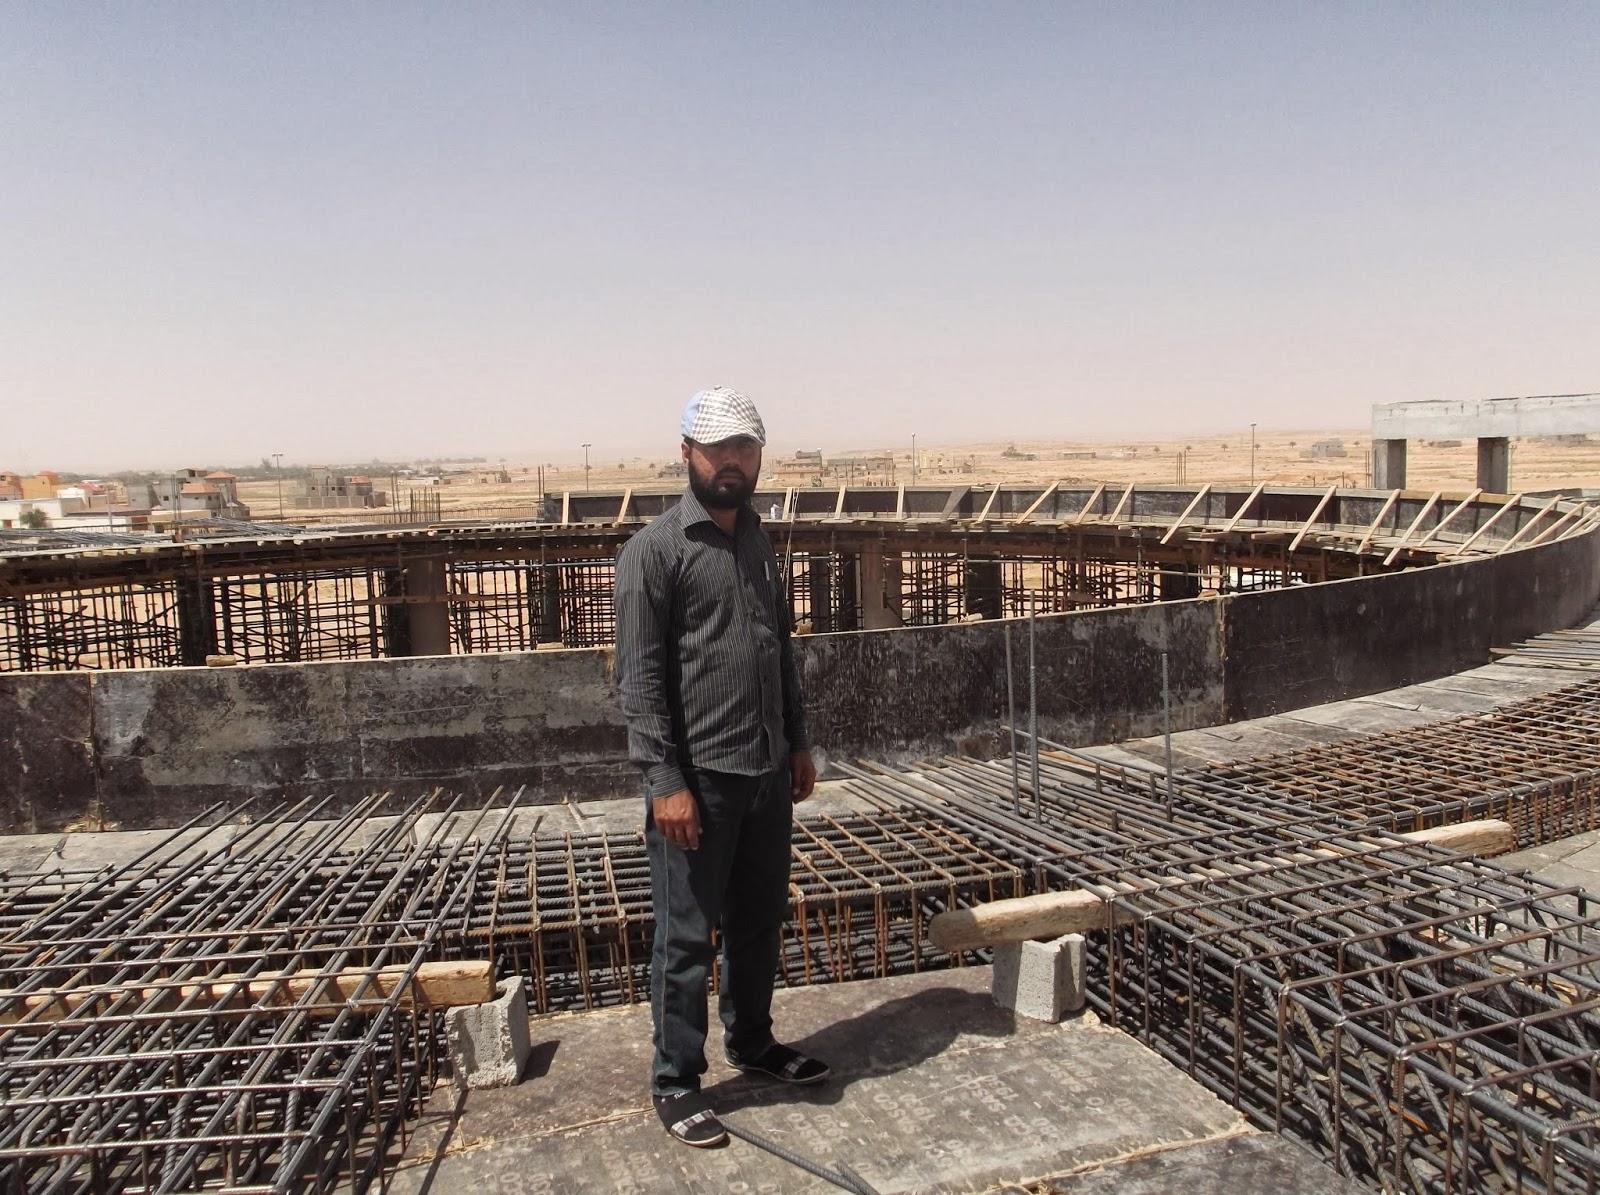 Construction work in saudi arabia